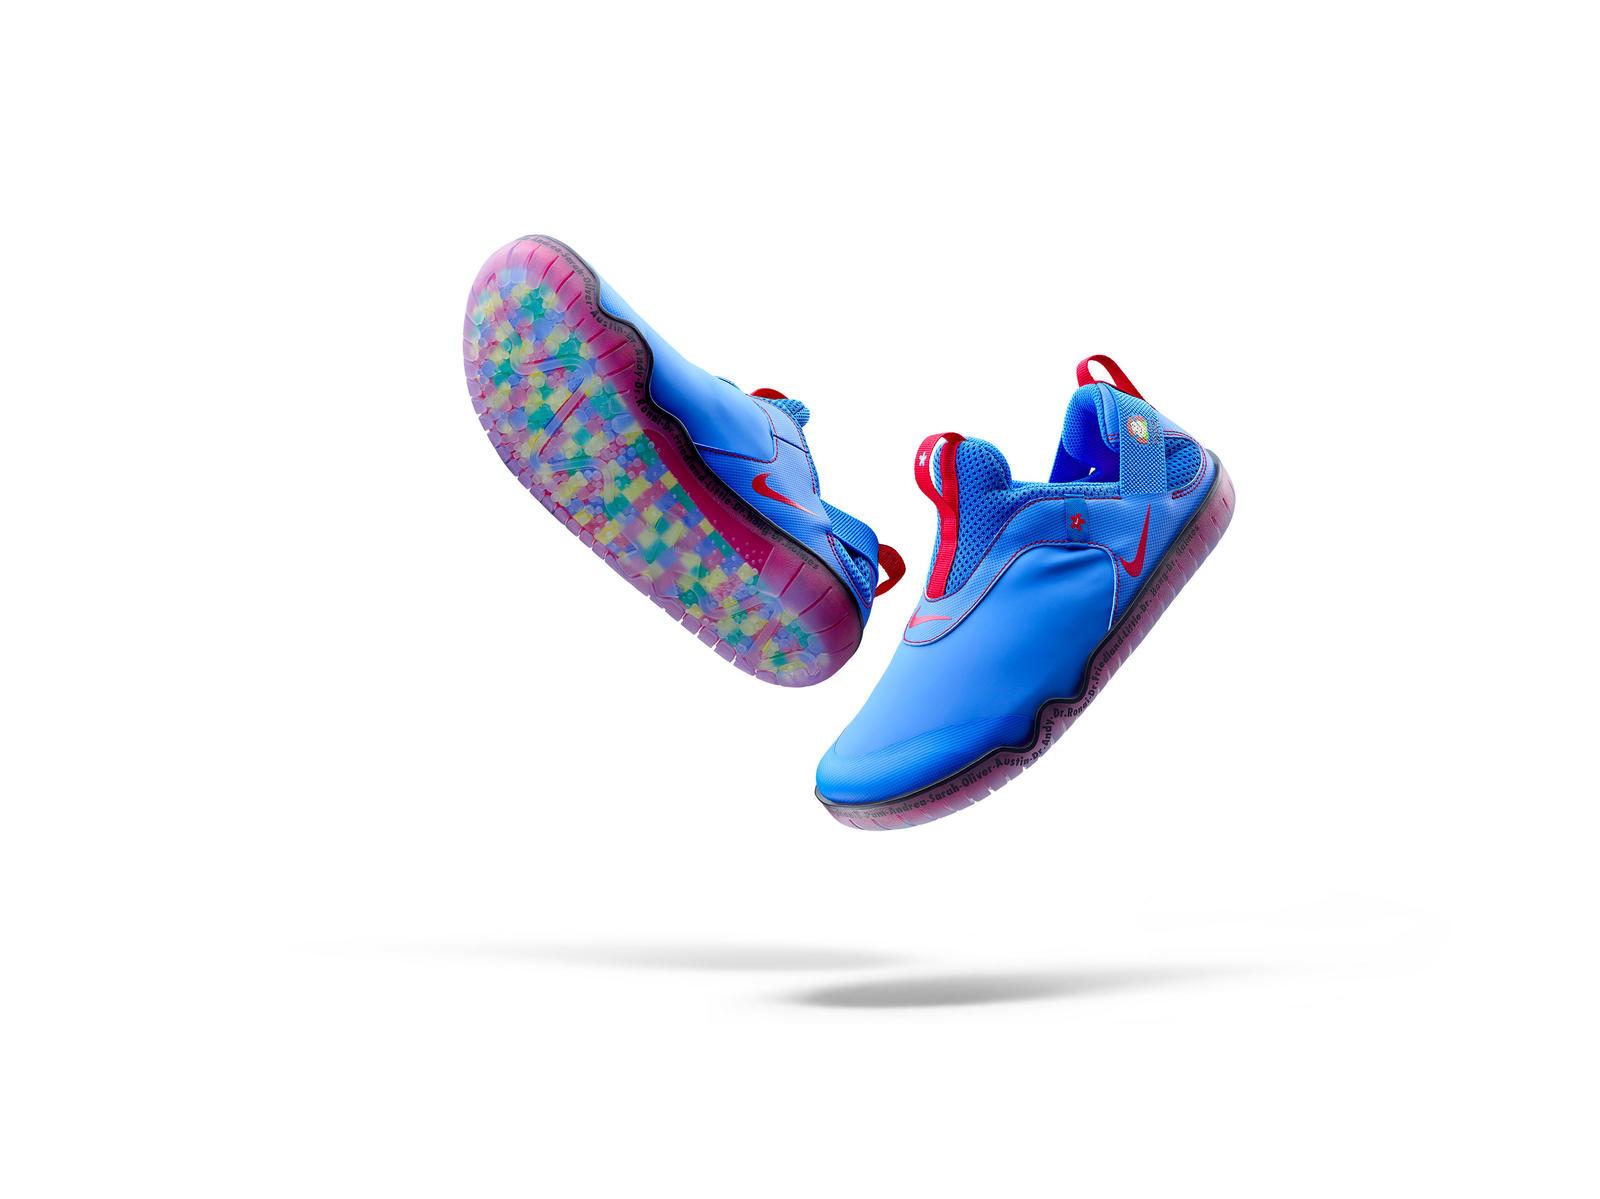 NikeNews_DoernbecherFreestyle2019_AirZoomPulse_Ethan_Freestyle_XVI_13305_91596